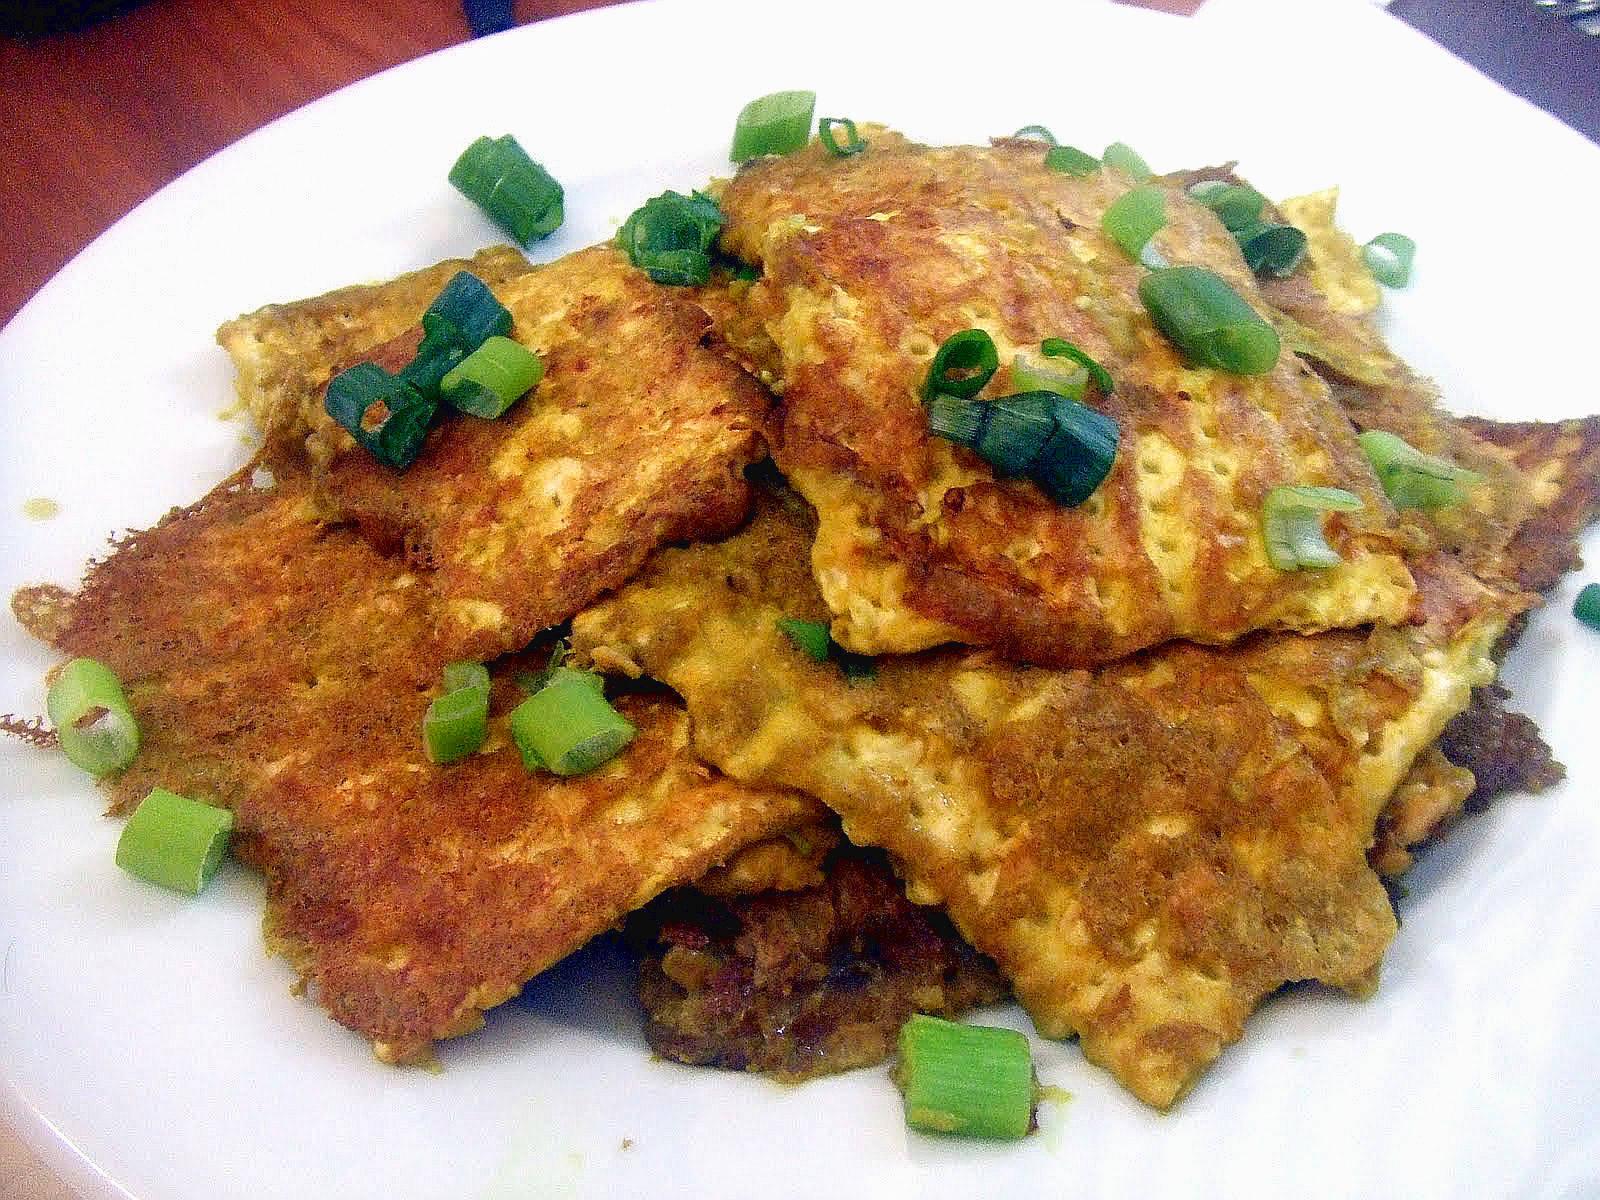 Vegan Fried Matzo/Matzo Brei